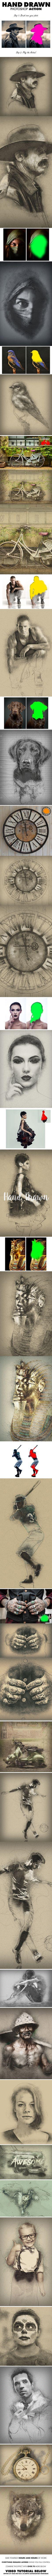 Hand Drawn Photoshop Action #photoeffect Download: http://graphicriver.net/item/hand-drawn-photoshop-action/13940500?ref=ksioks